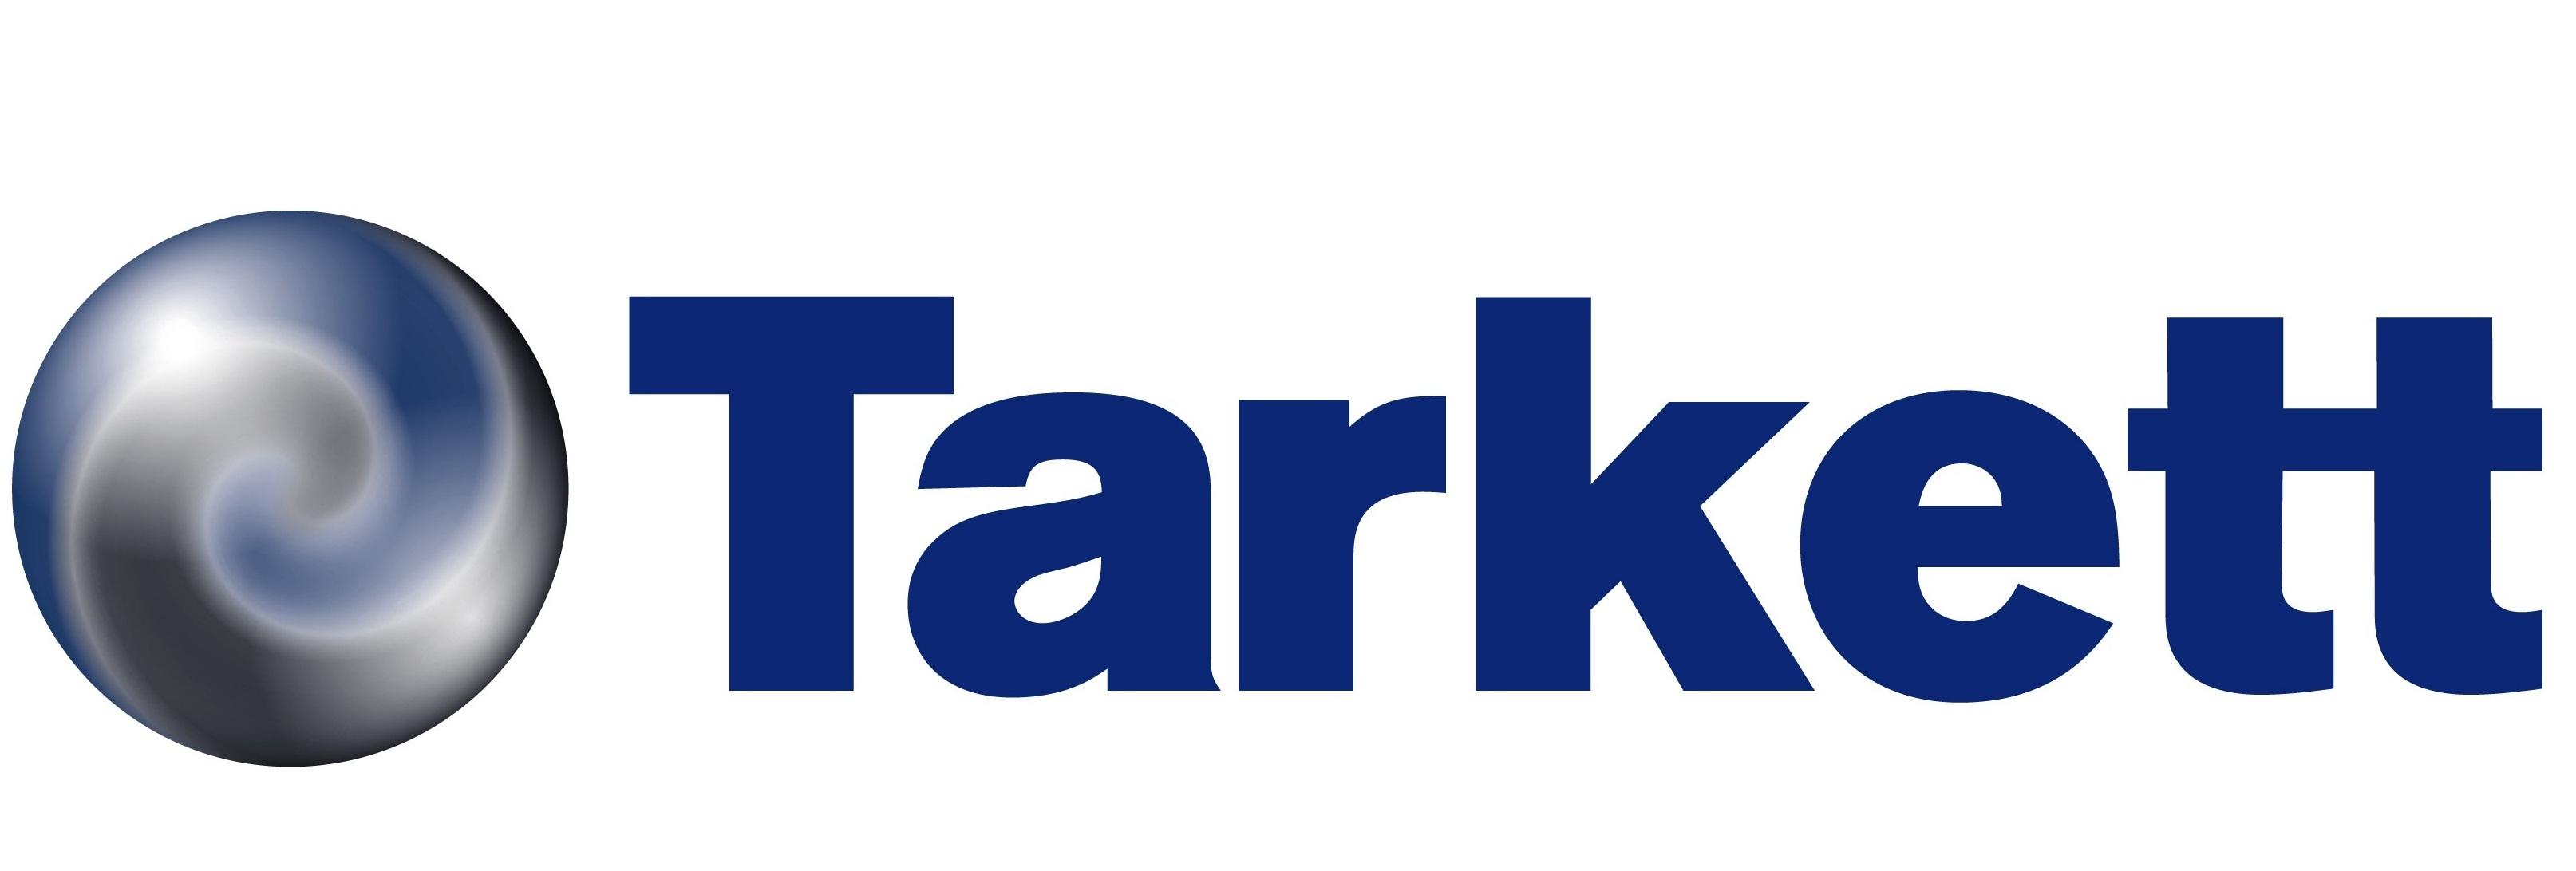 TARKETT image